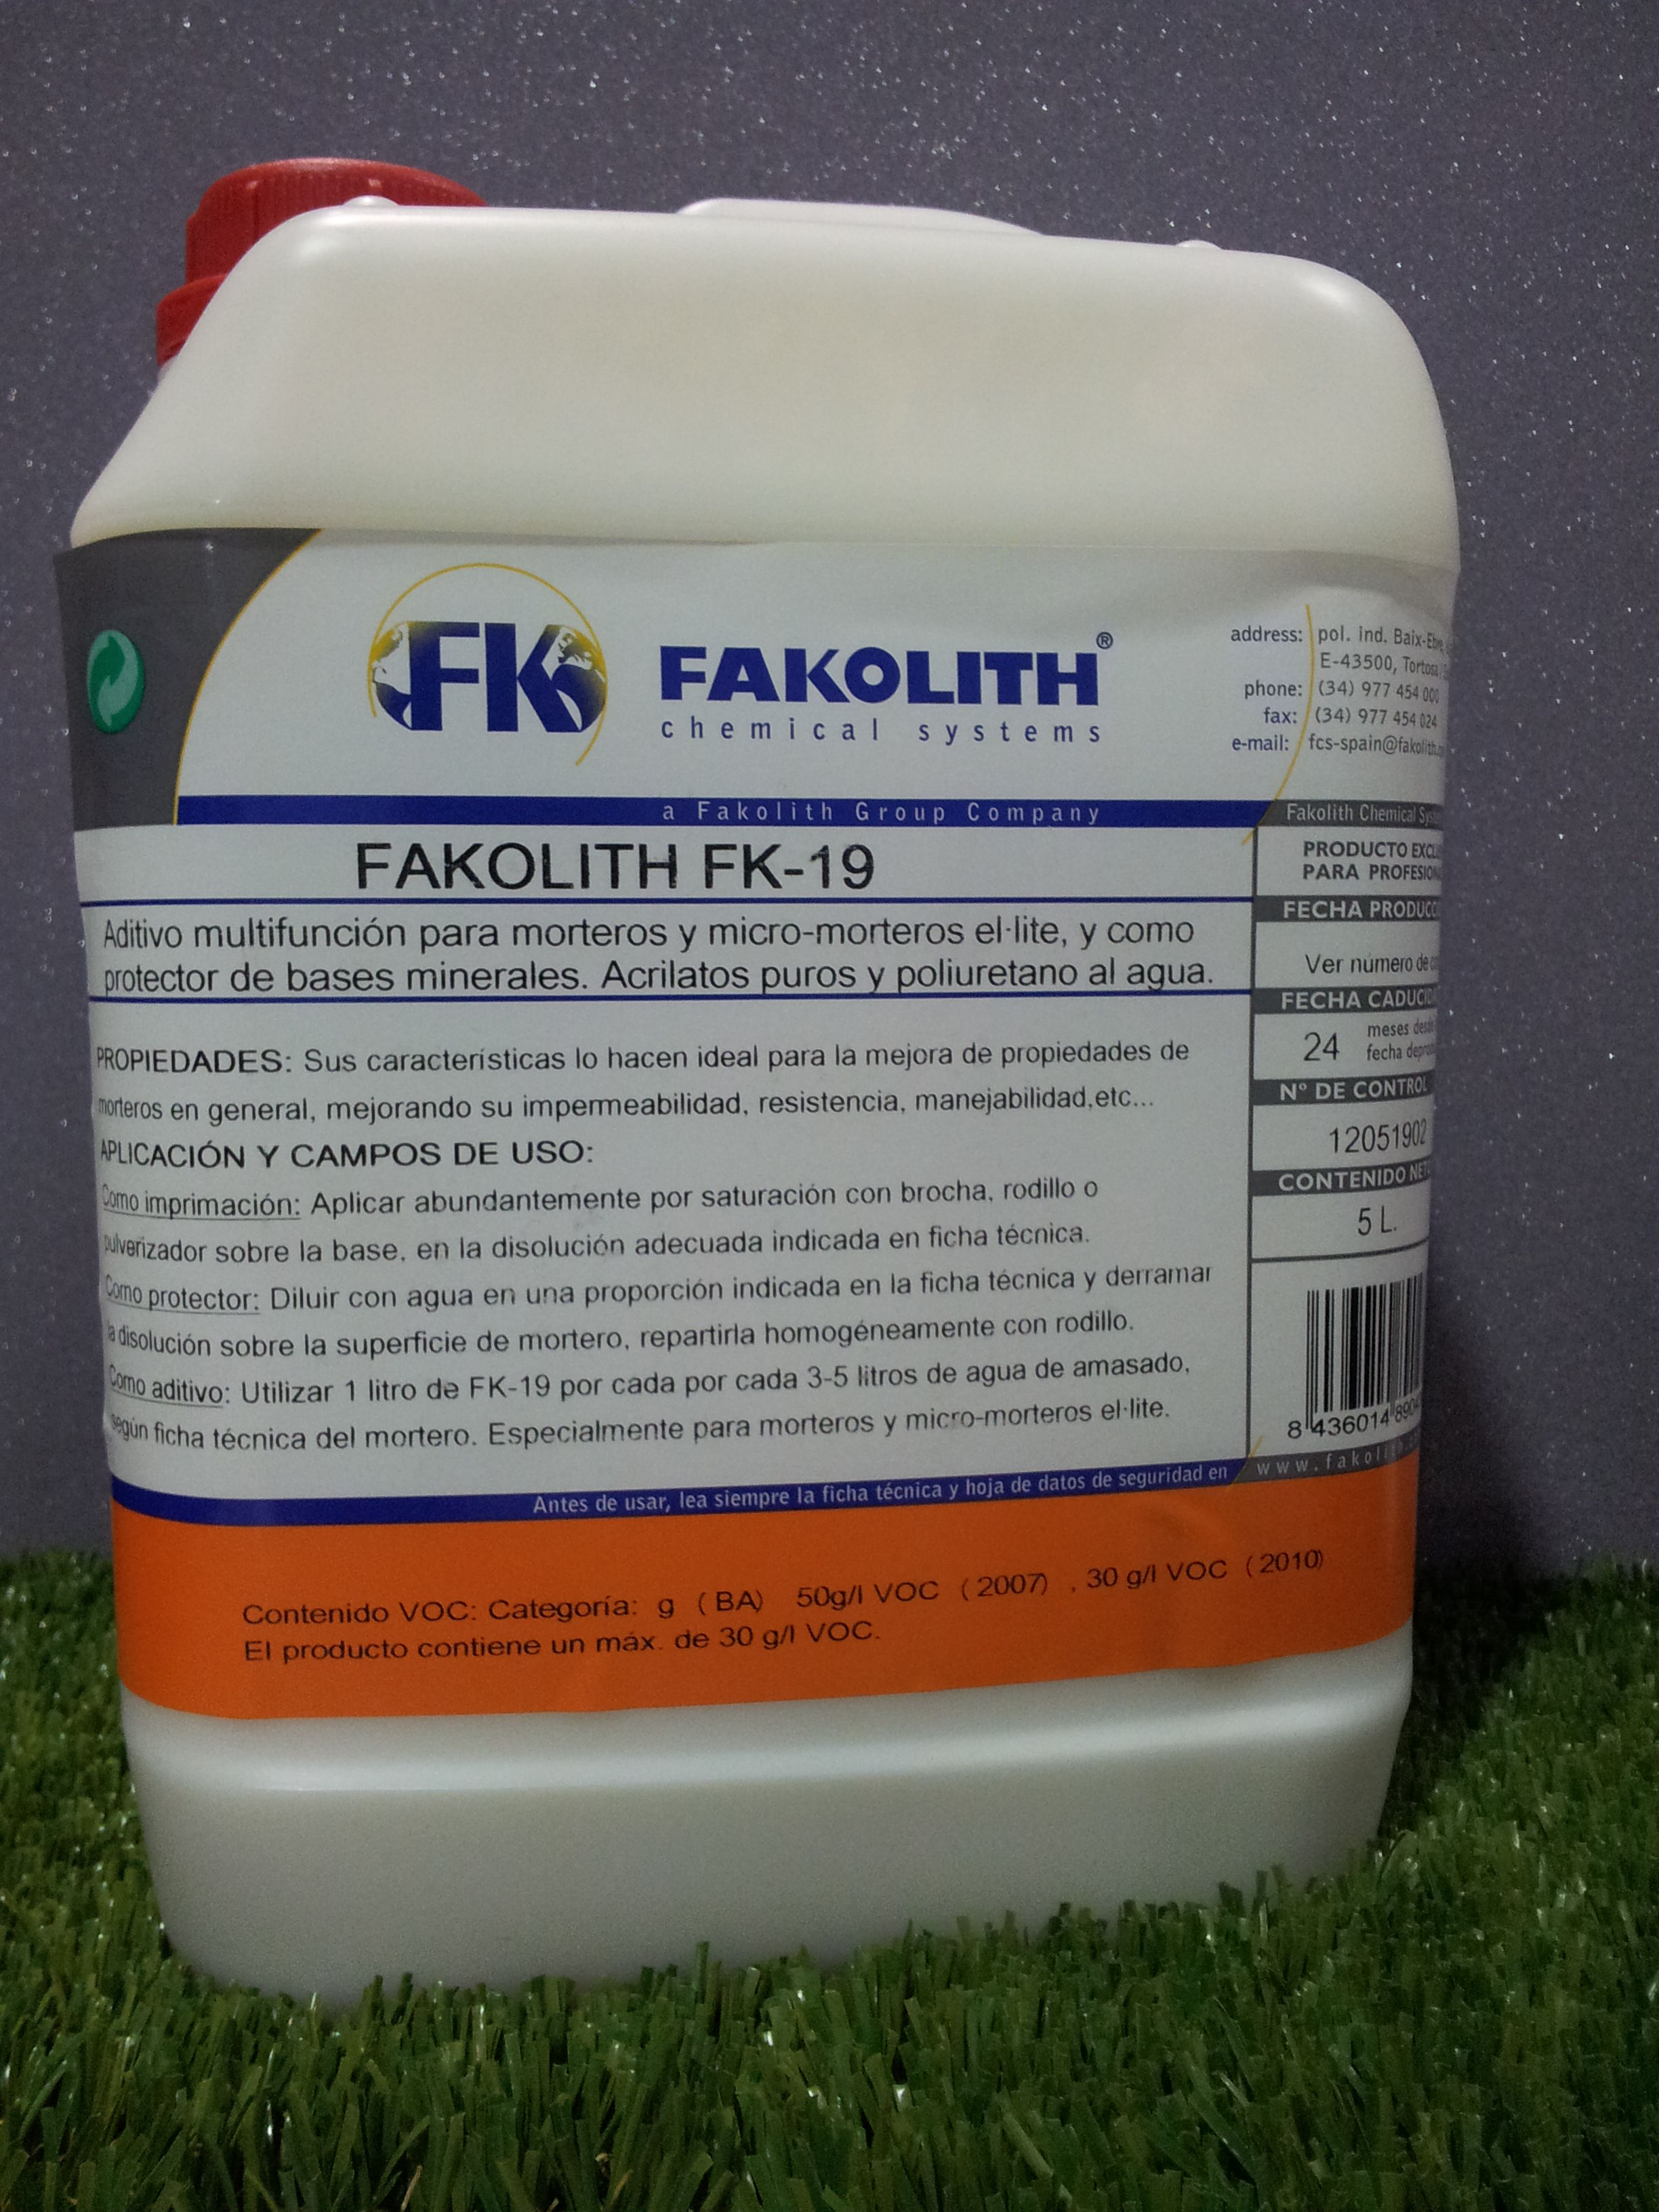 Fakolith FK-19